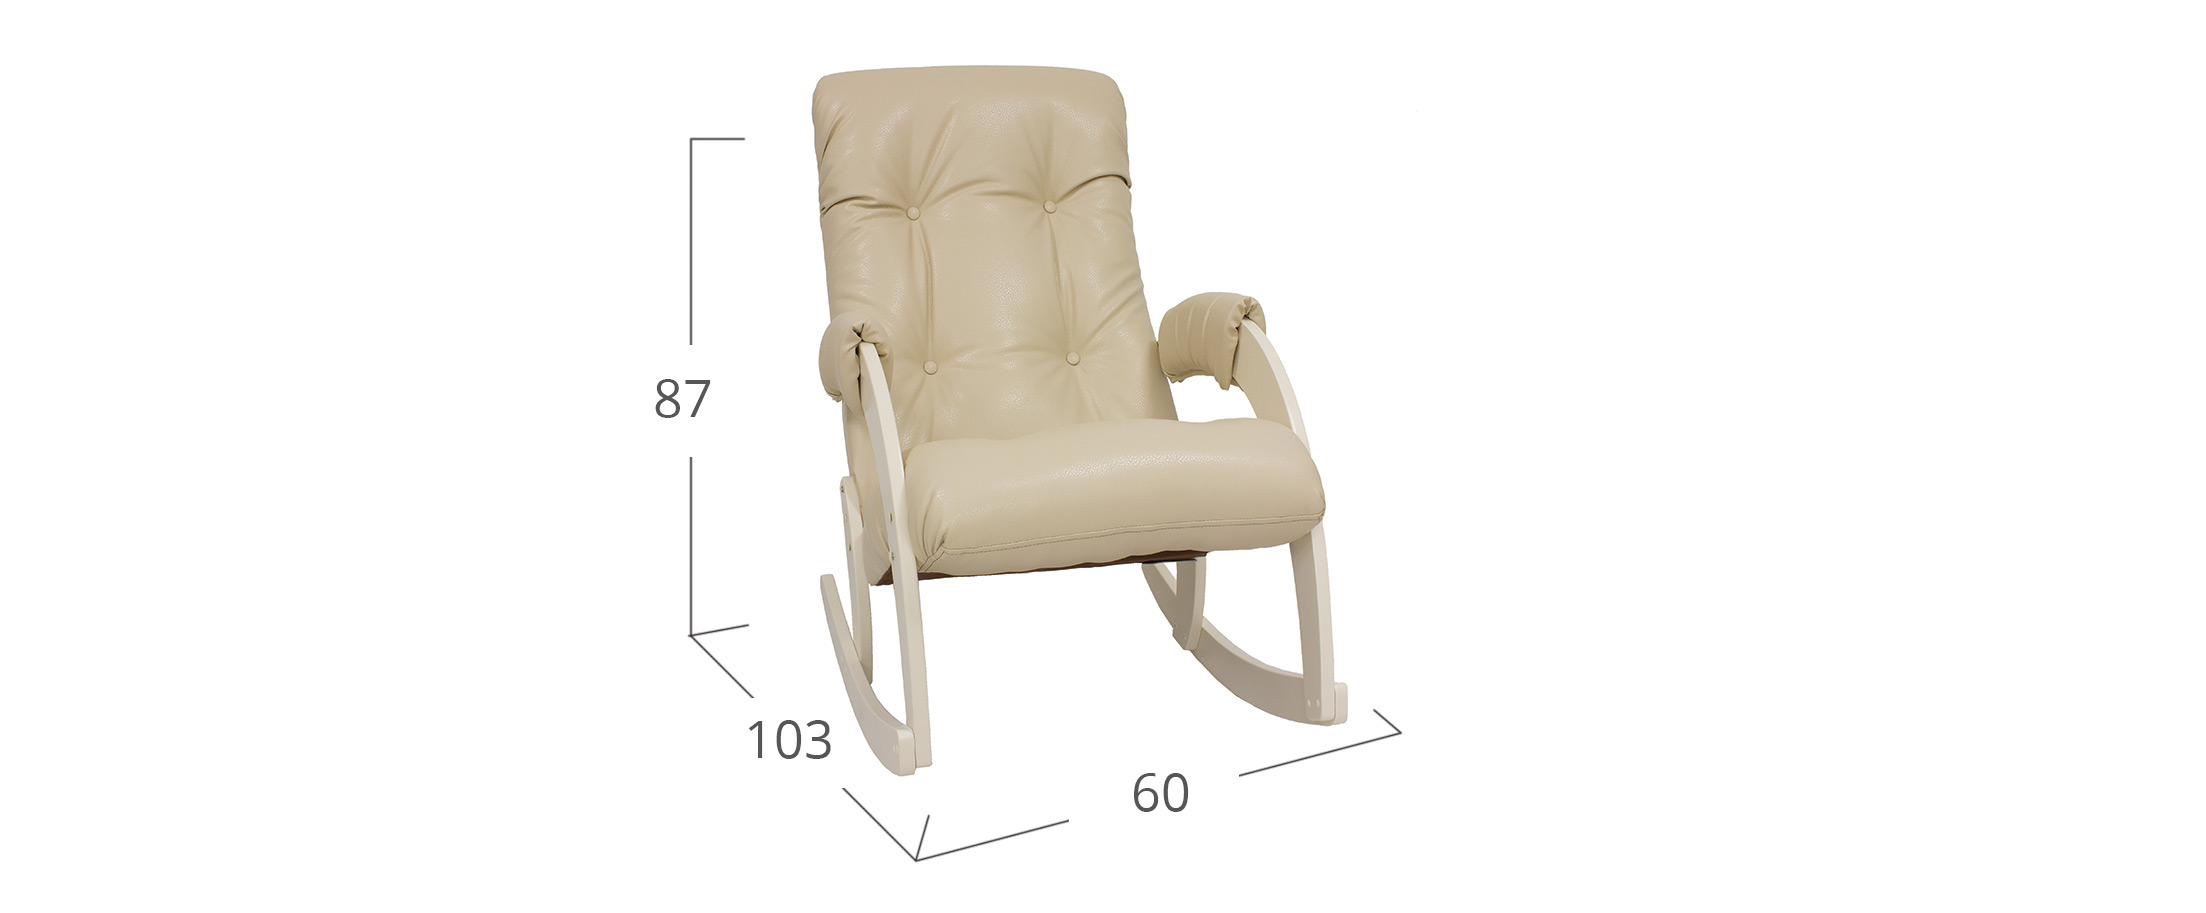 Кресло-качалка 67 Polaris Beige, дуб шампань Модель 364